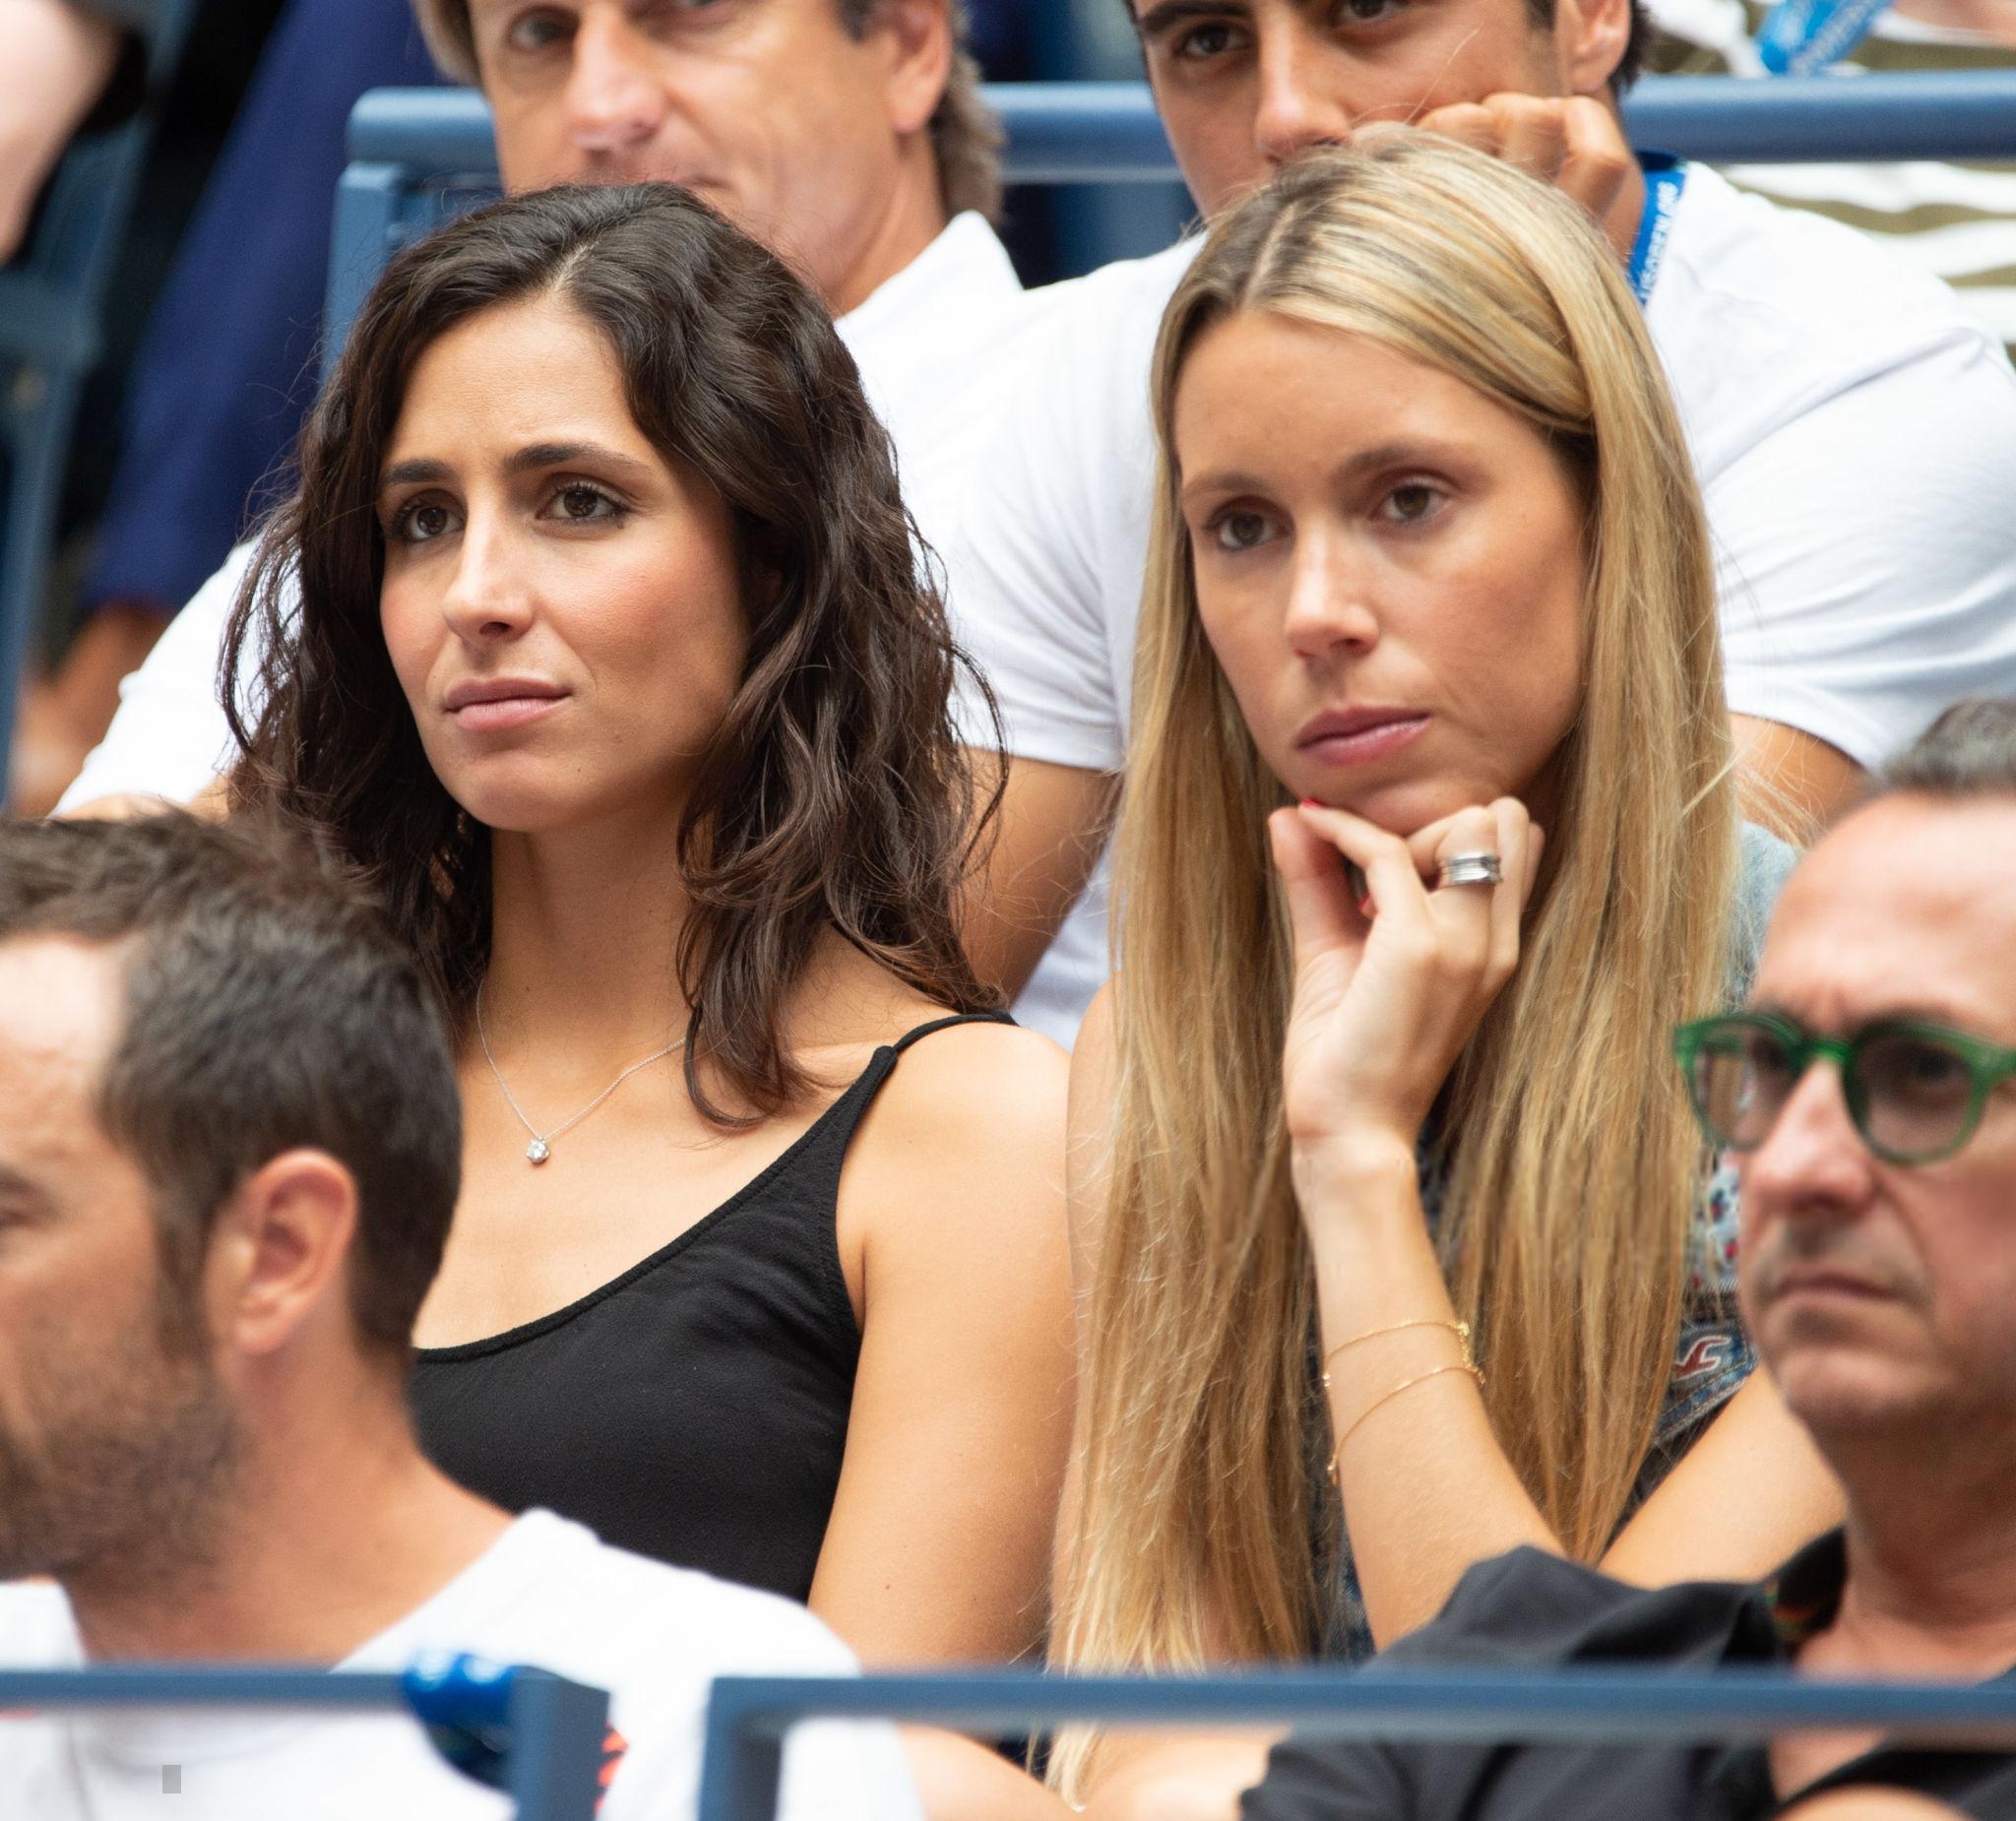 Rafa S Girlfriend Maria Francisca Perello And Sister Maria Isabel Nadal 2018 Us Open 2 Rafael Nadal Fans